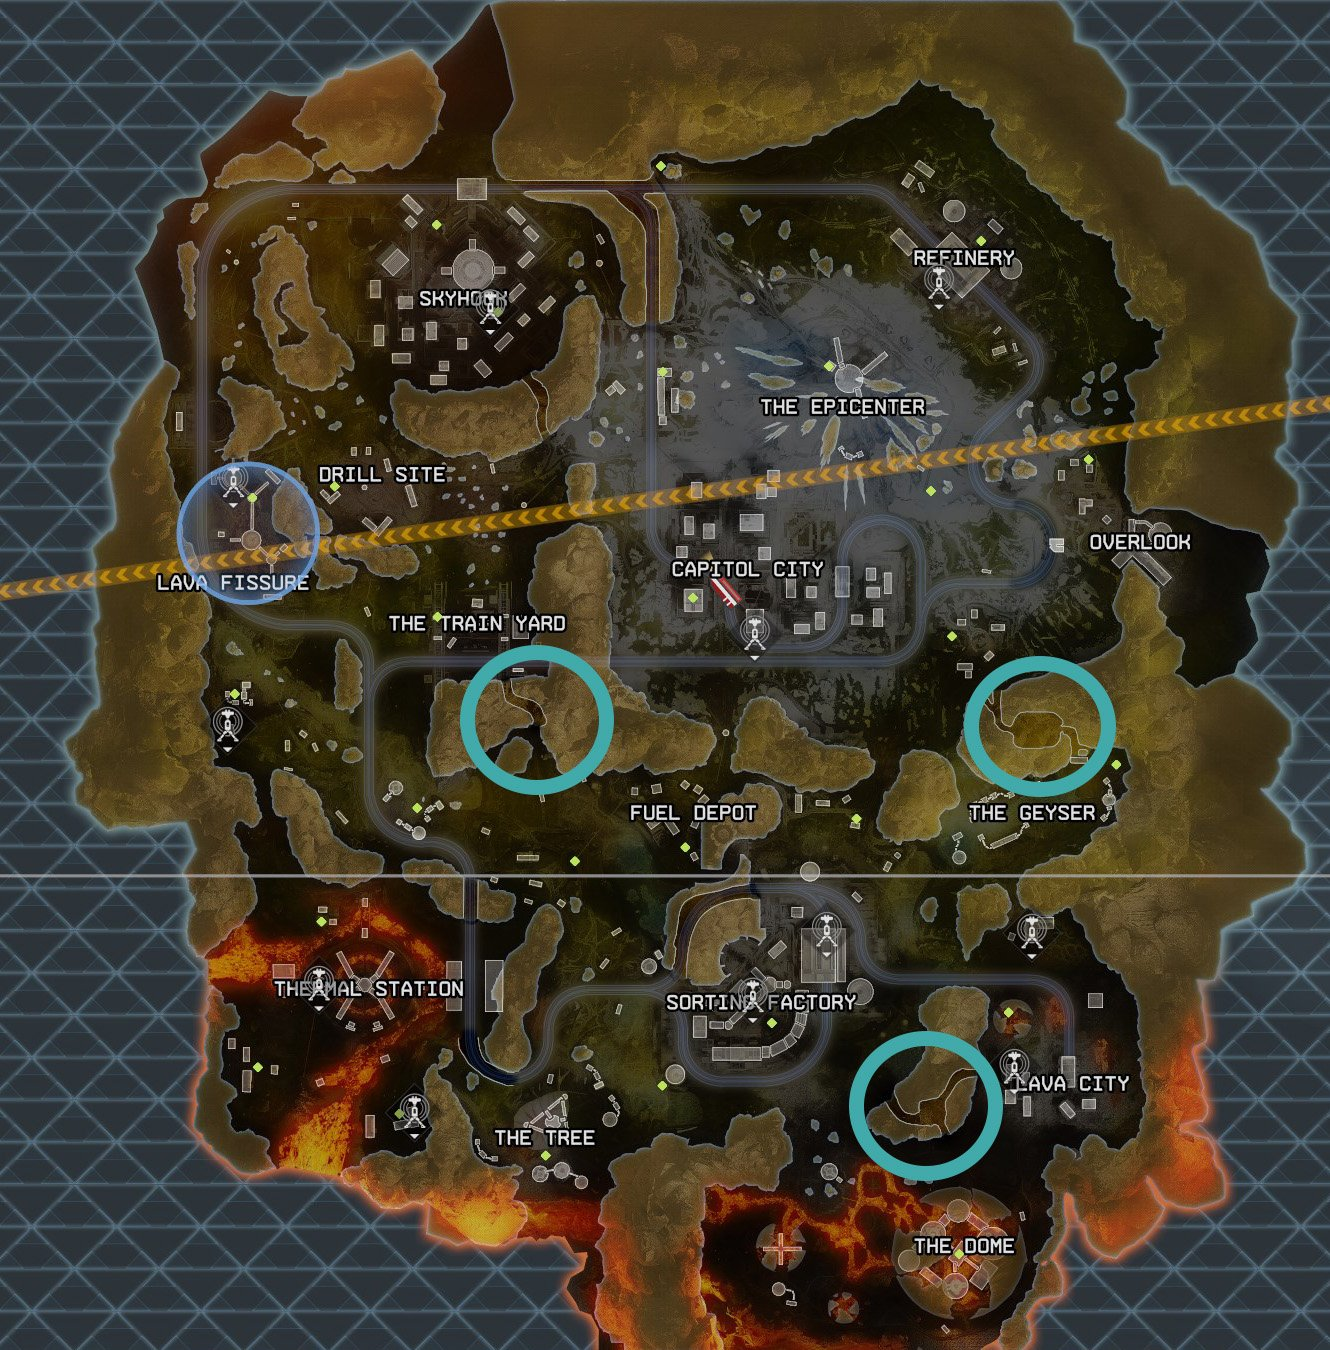 Apex Legends Vault locations